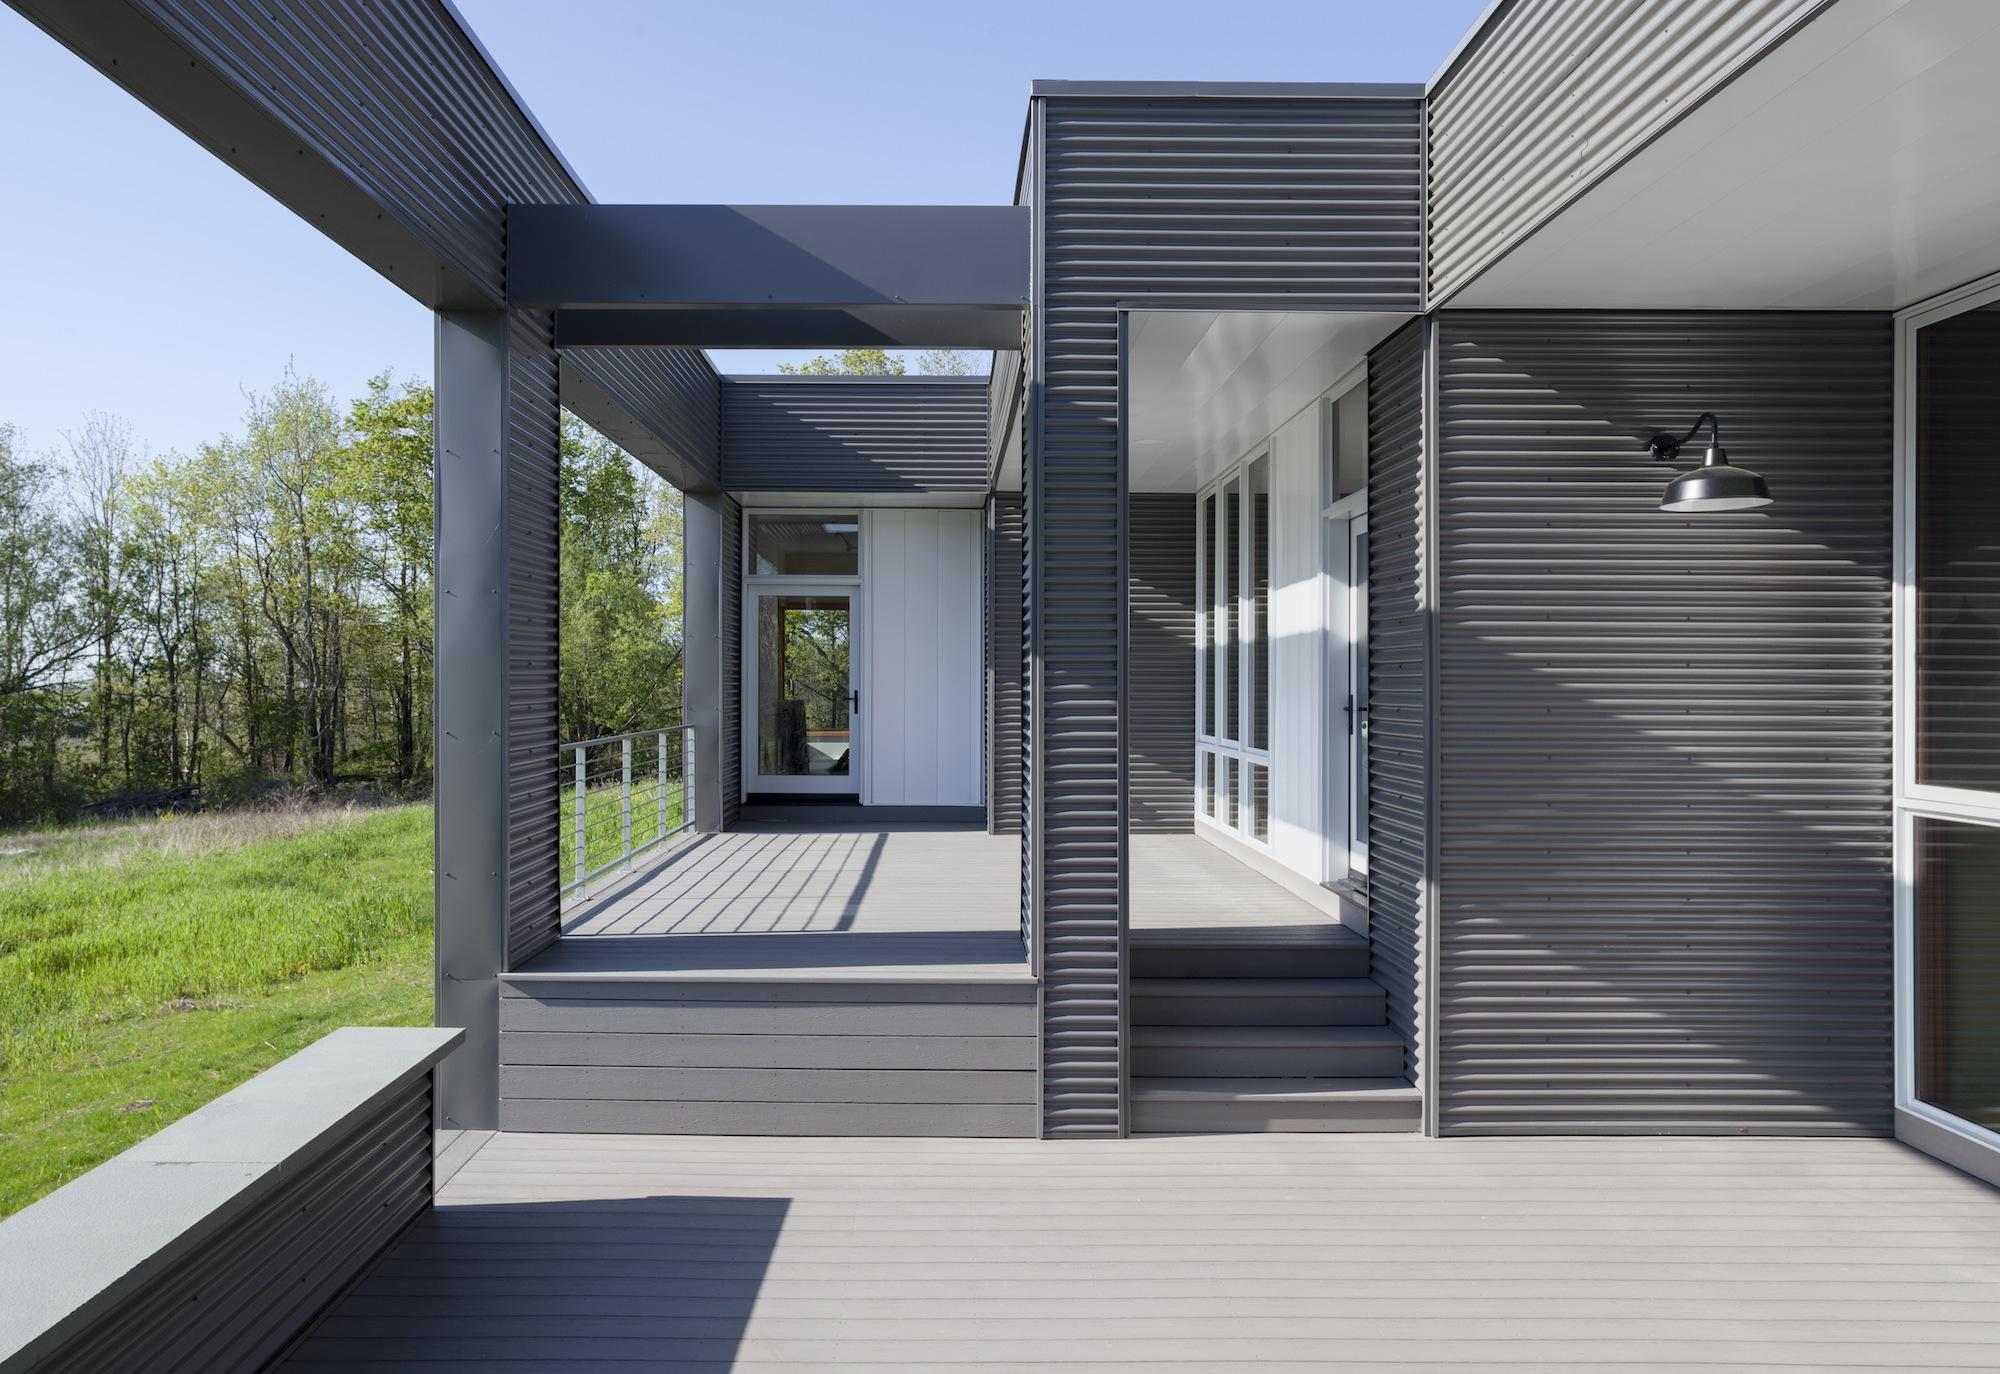 schickel-construction-exterior-seneca-lake.jpg